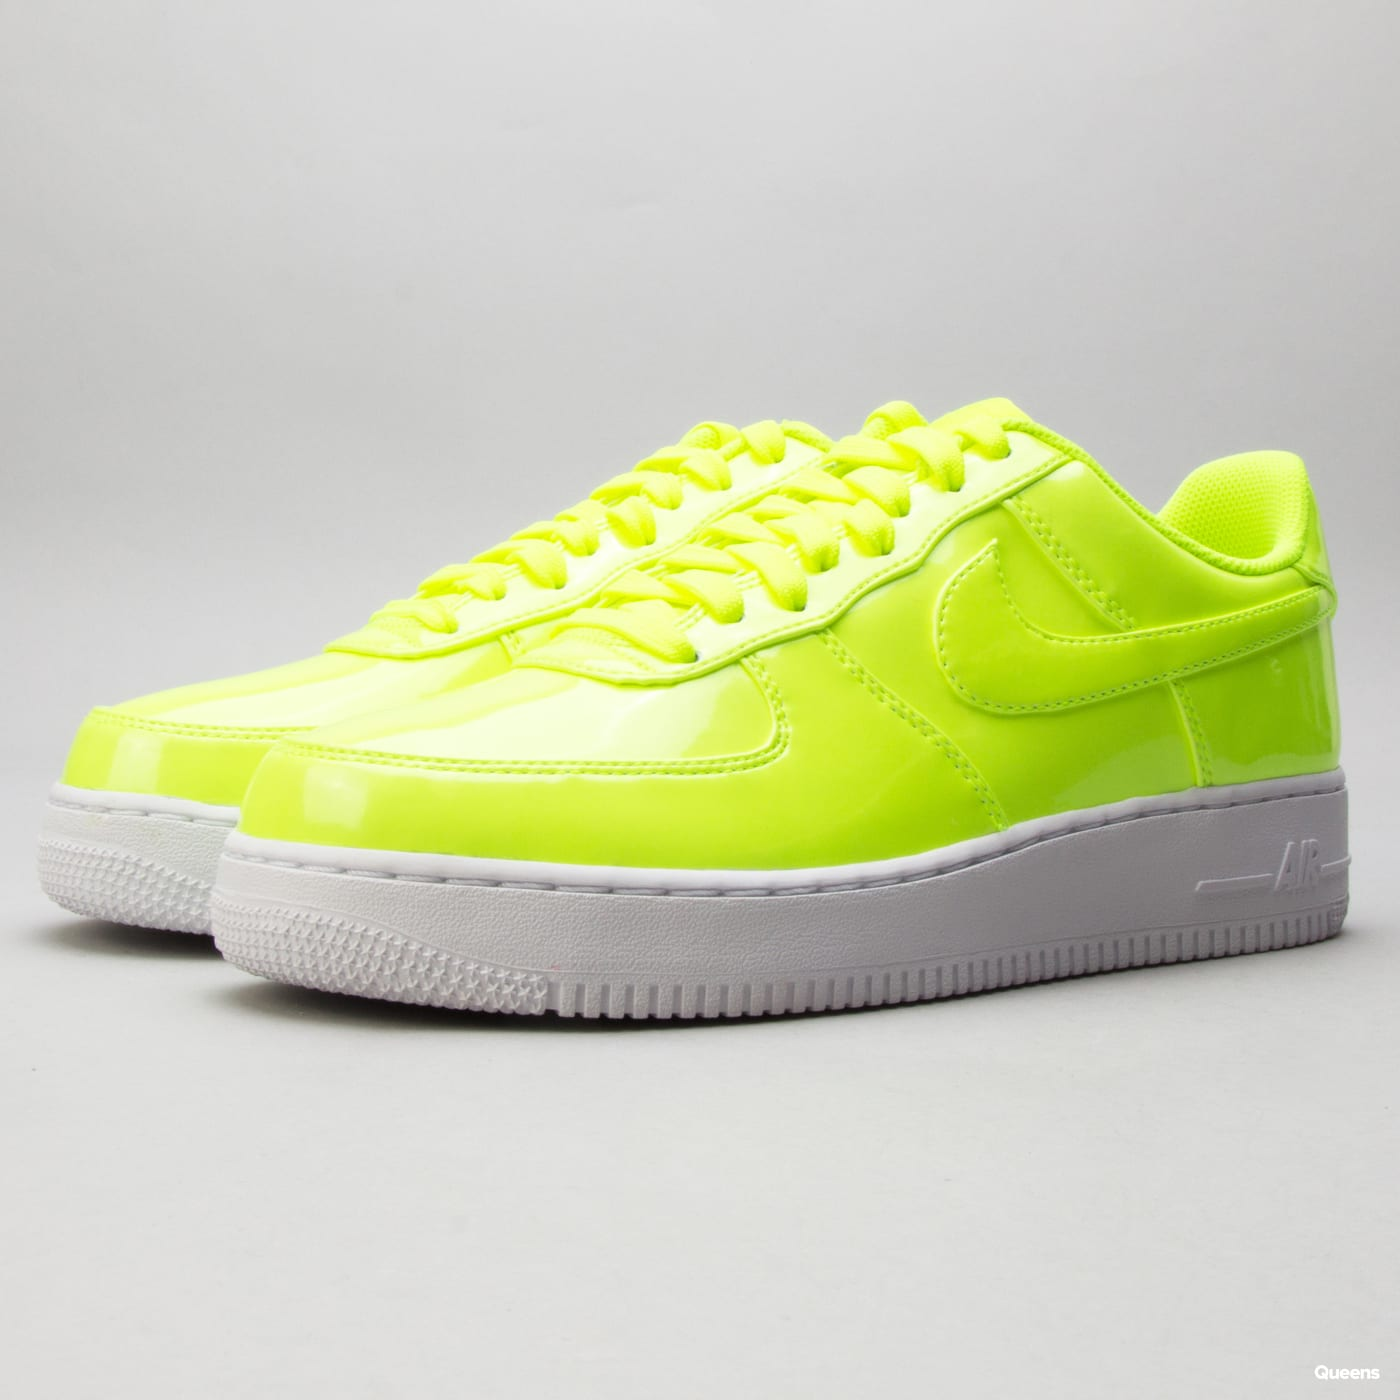 sale retailer f7d70 844f7 Sneakers Nike Air Force 1  07 LV8 UV (AJ9505-700)– Queens 💚